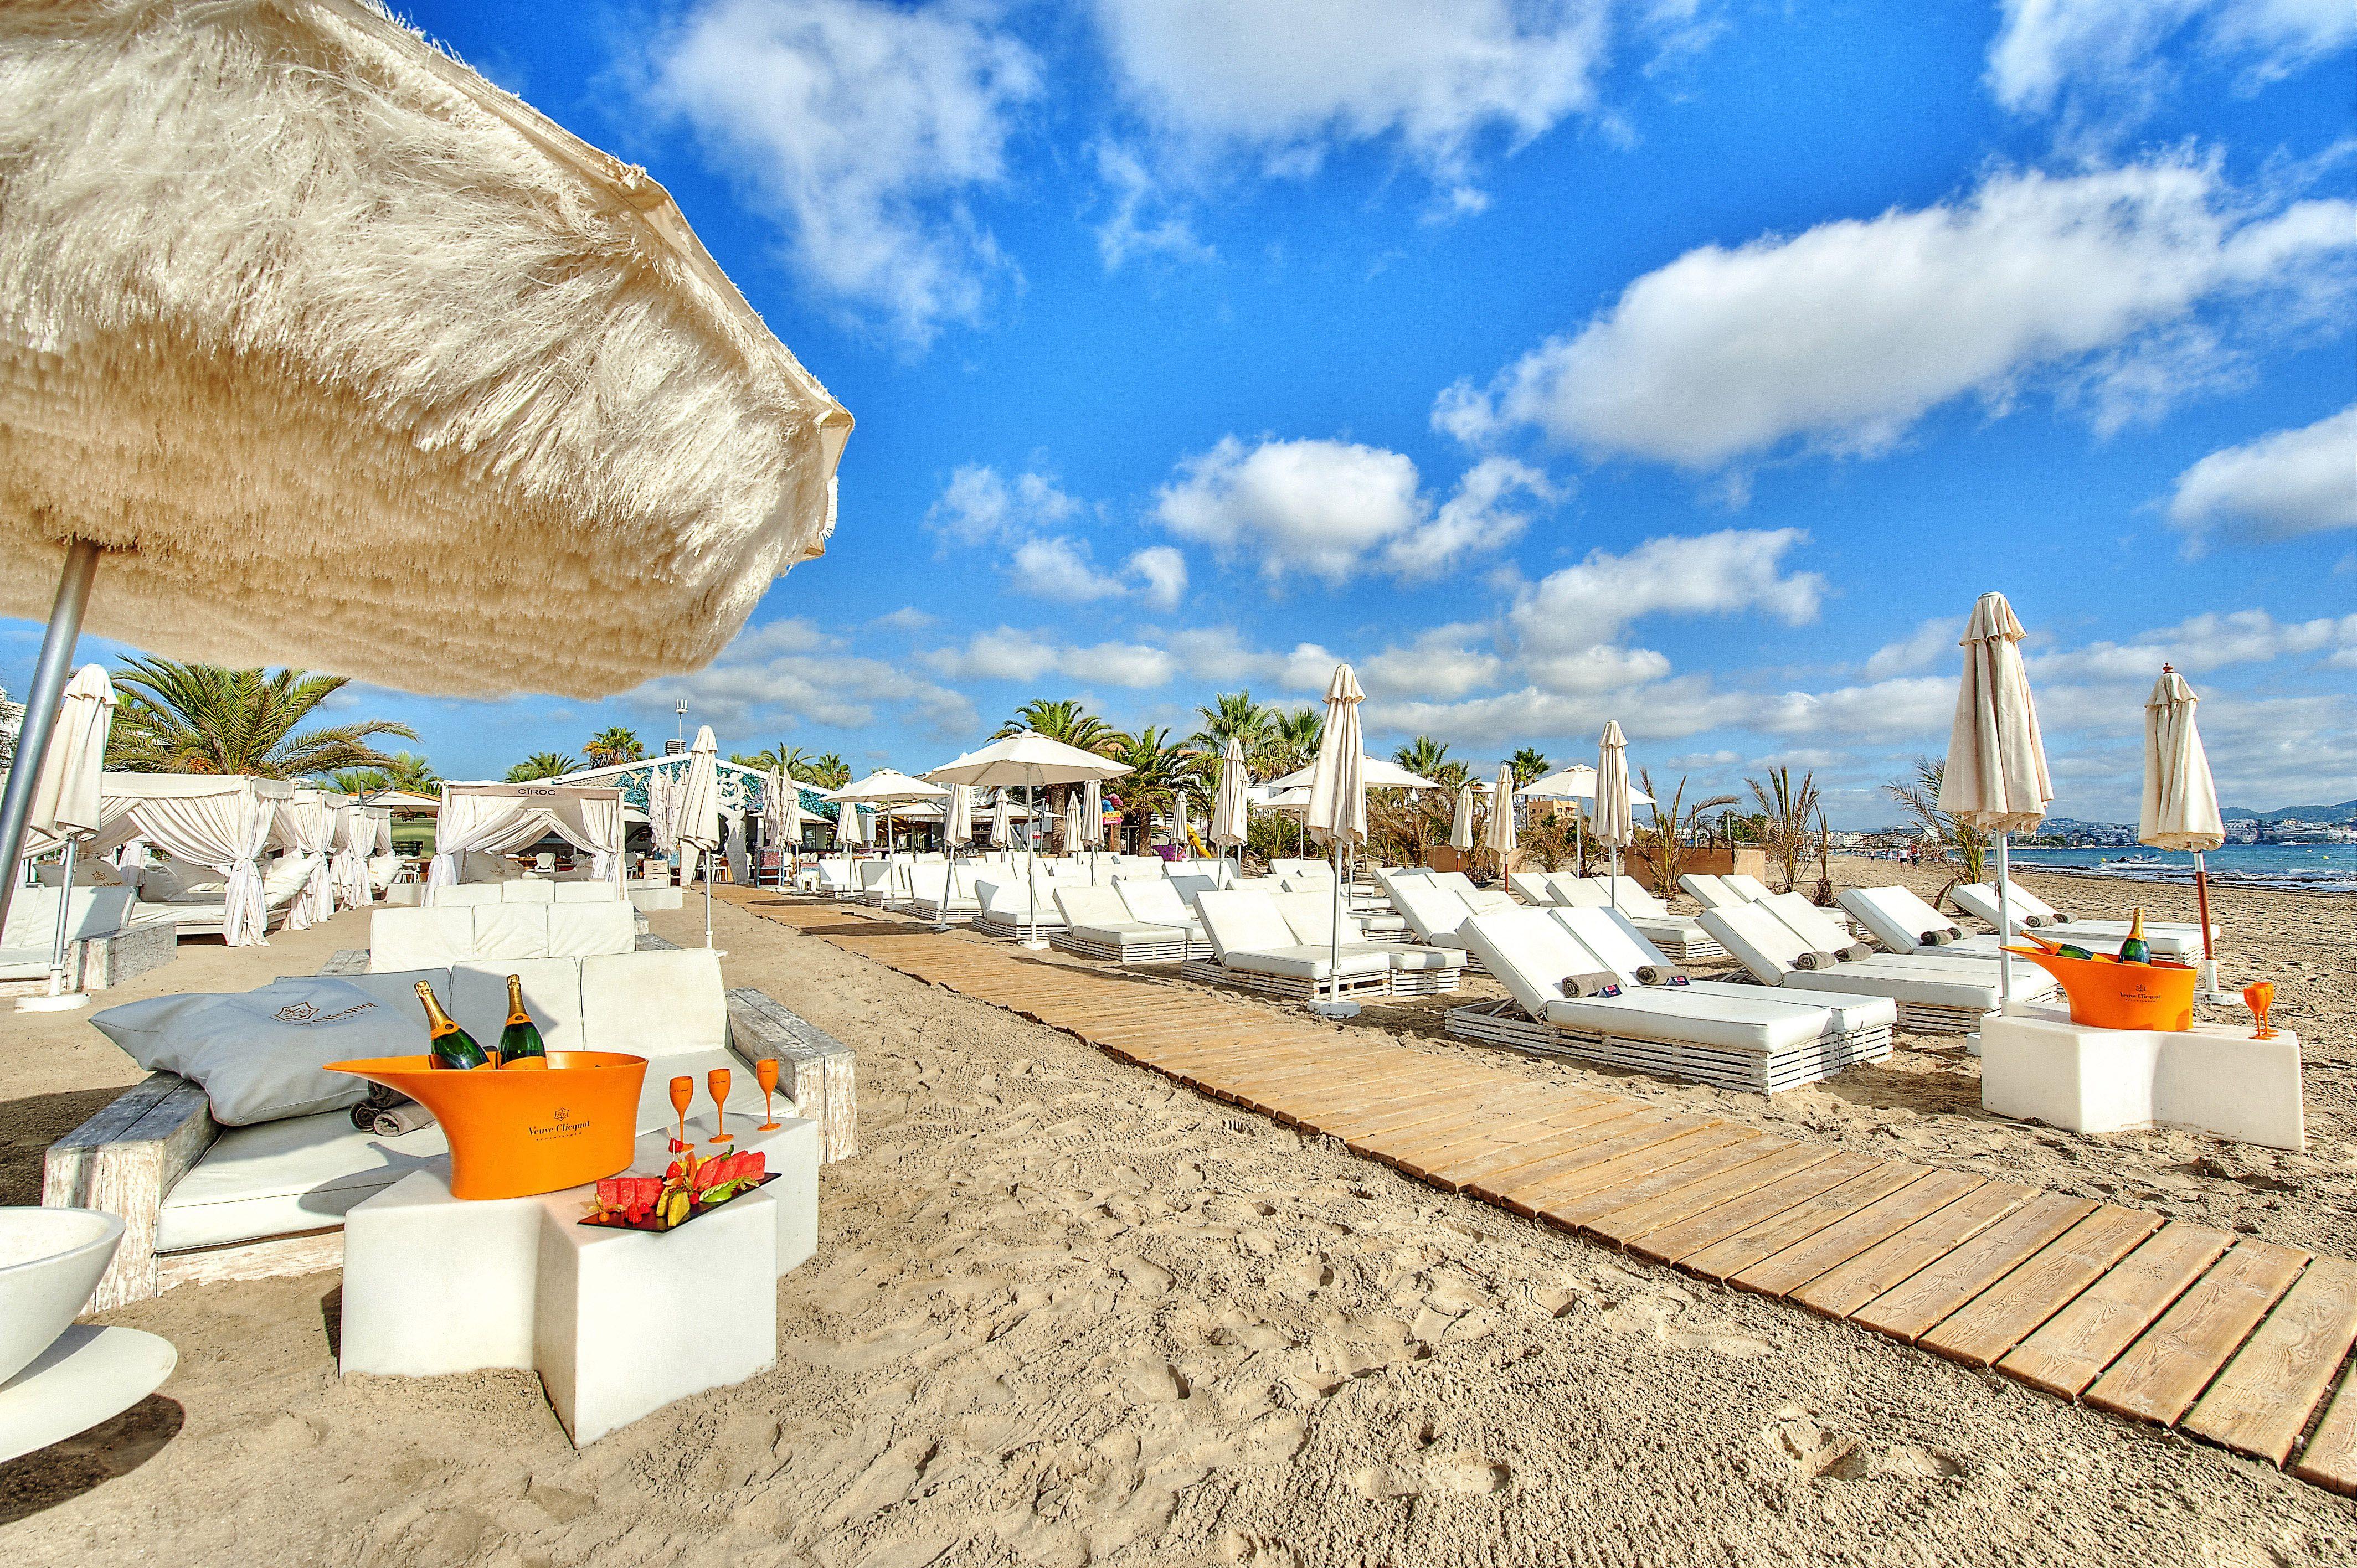 Ushuaia Beach Club Restaurant Ibiza Playa D En Bossa Ibiza Beach Hotel Ibiza Beach Beach Hotels